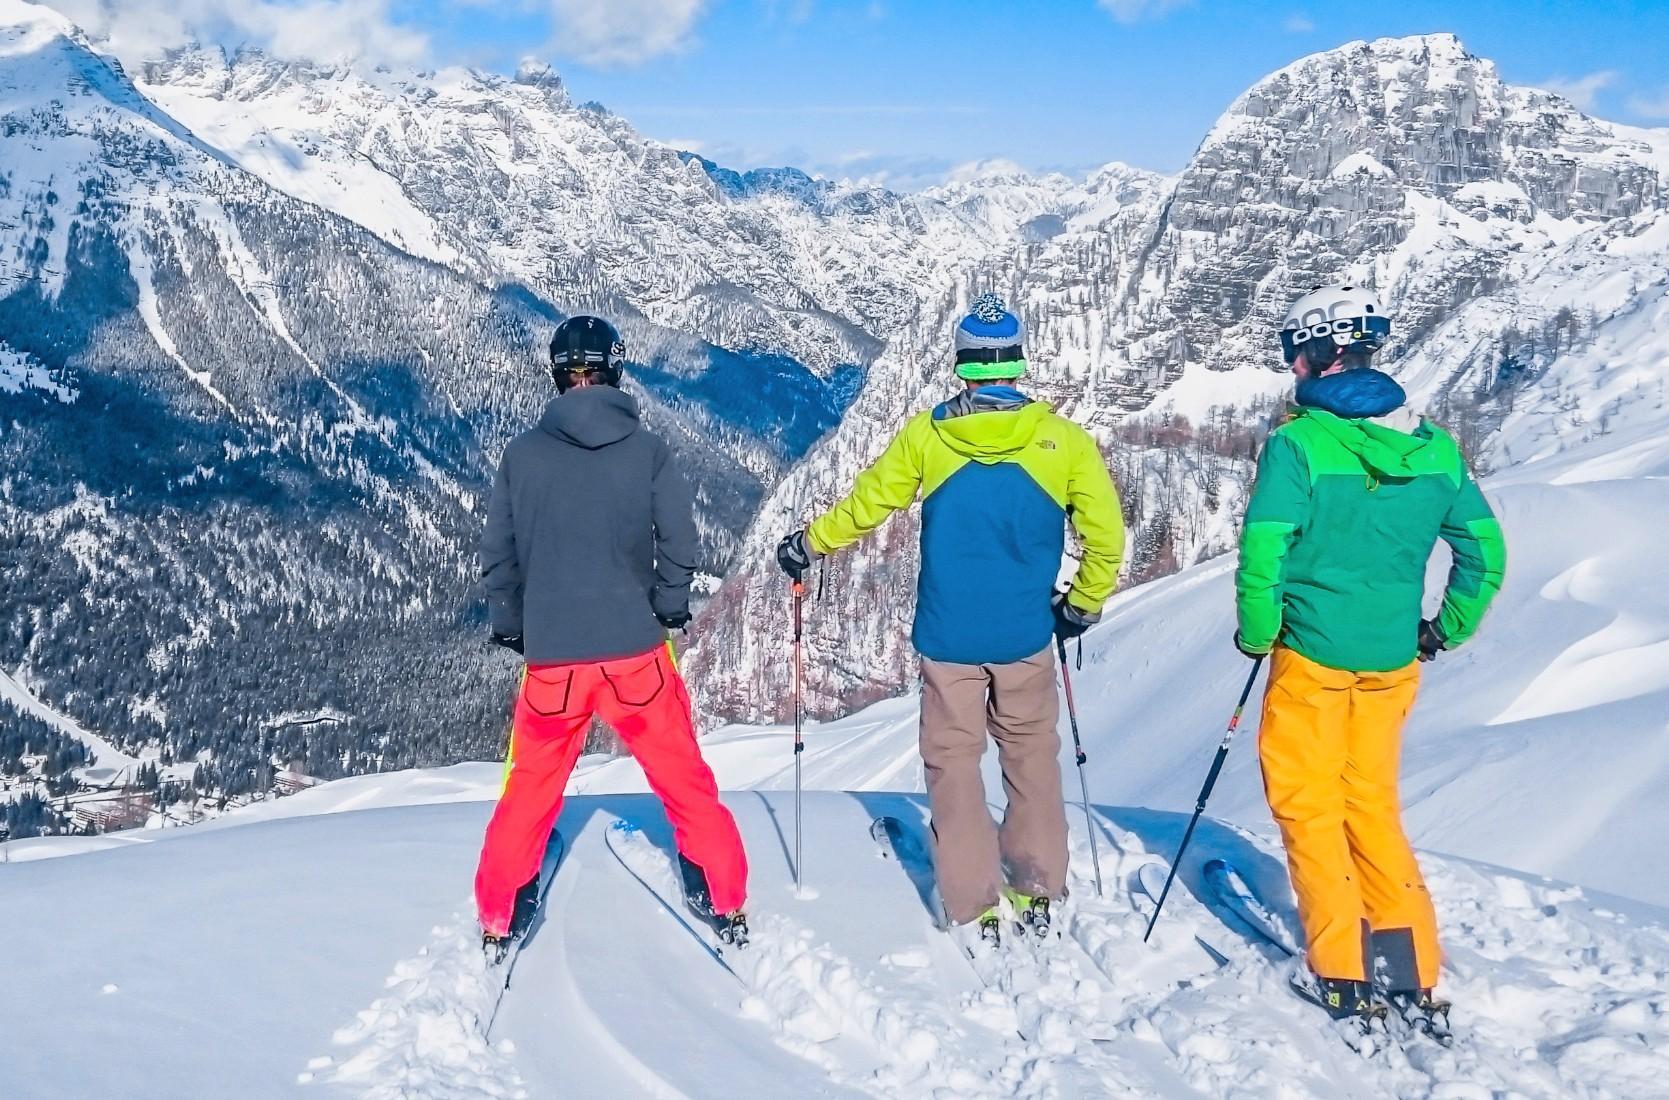 Lezioni private di sci per adulti a partire da 3 anni per tutti i livelli